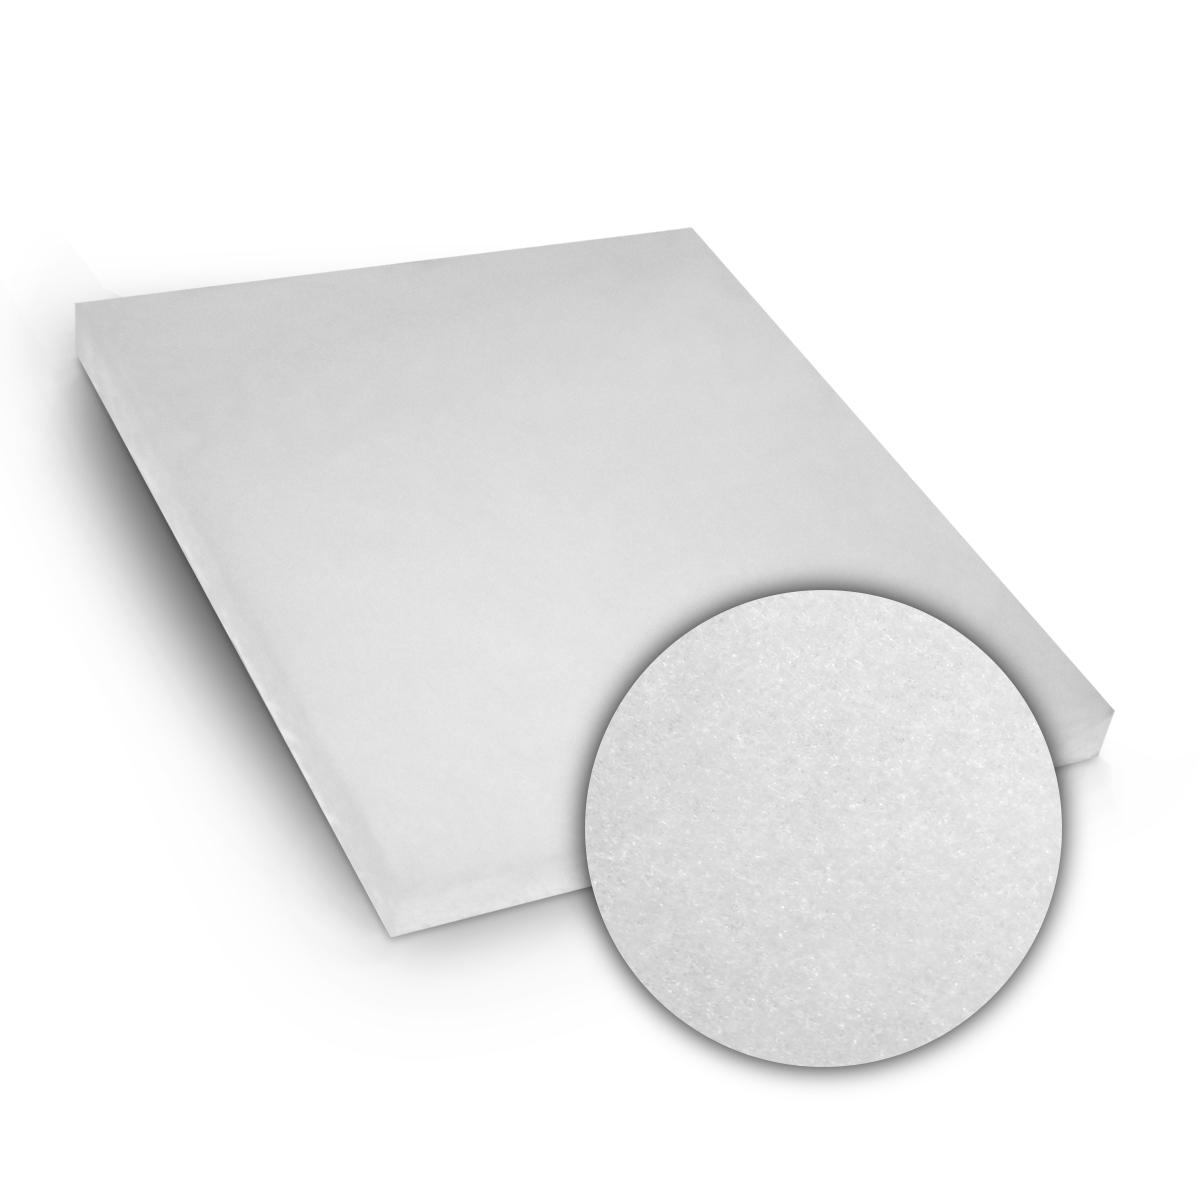 20x20x1 Sure-Fit LEVEL 10 MERV 10 Anti-Microbial Pad